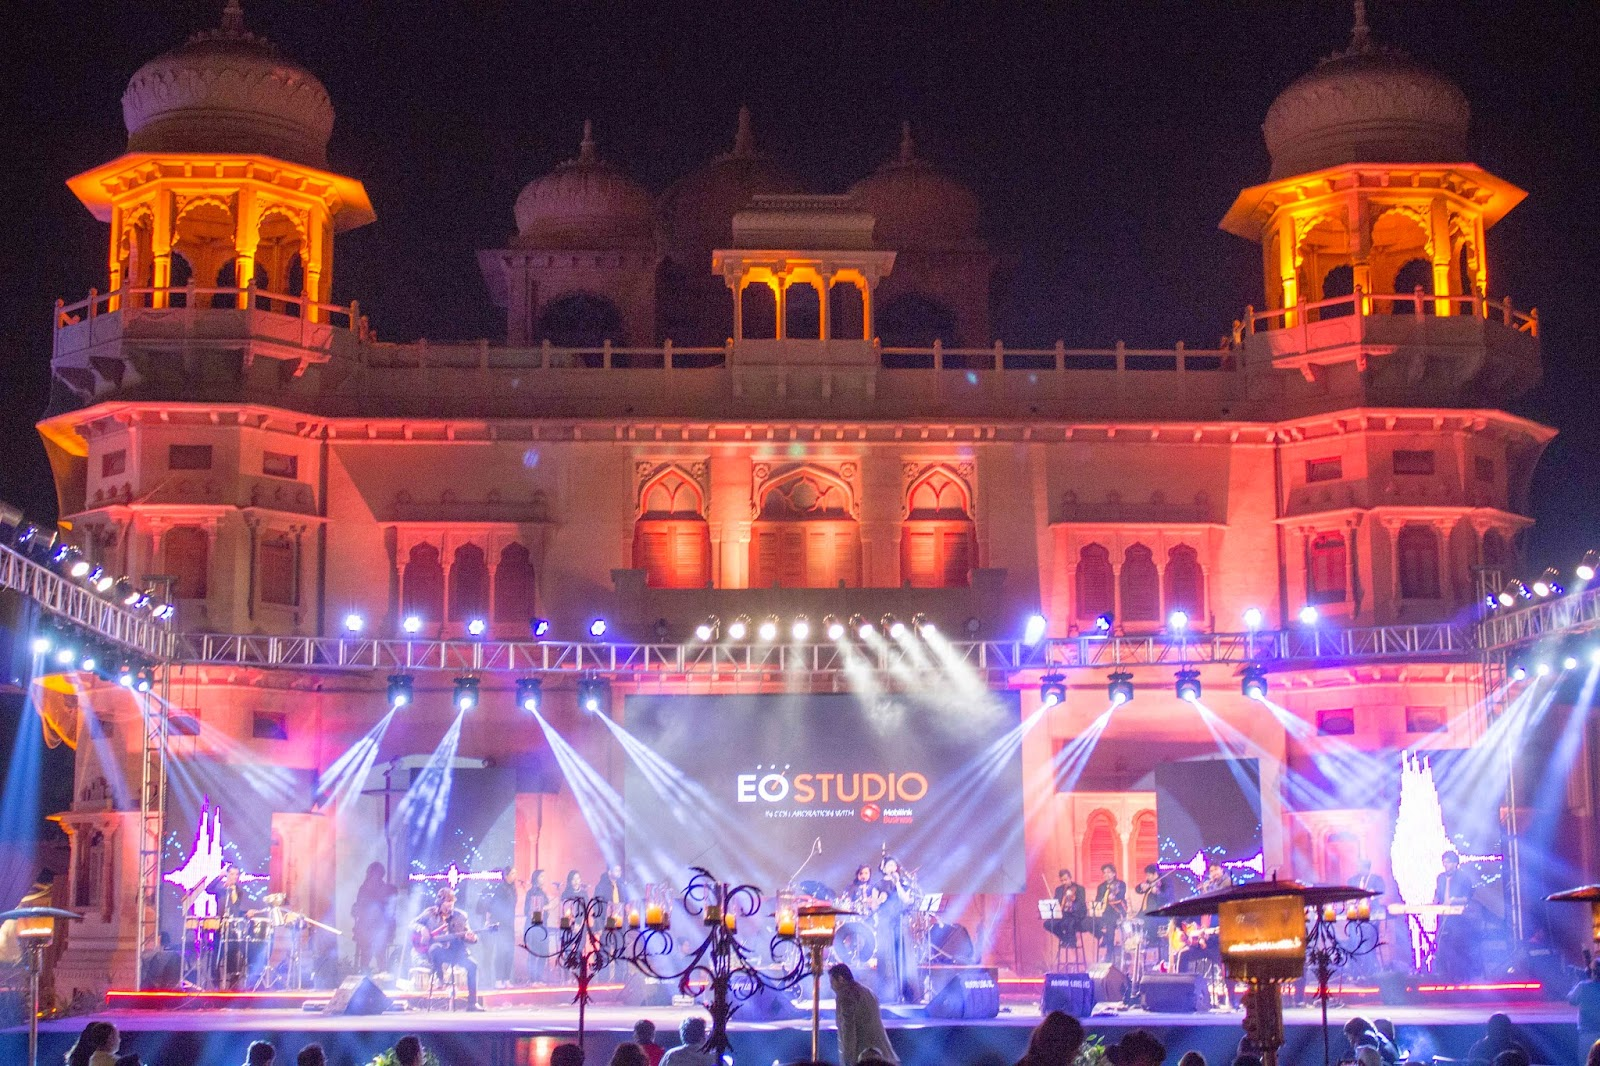 EO studio mohatta palace concert